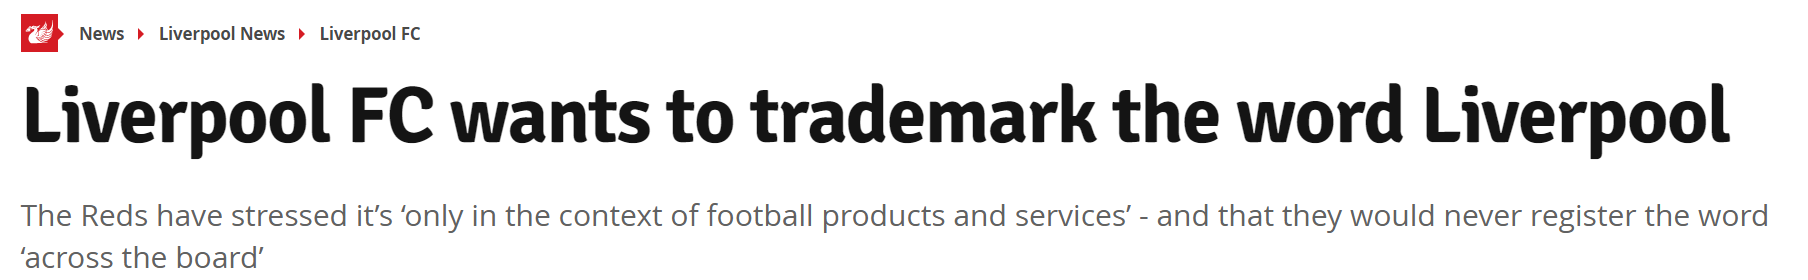 <b>防止假冒产品,利物浦将为利物浦一词注册商标</b>